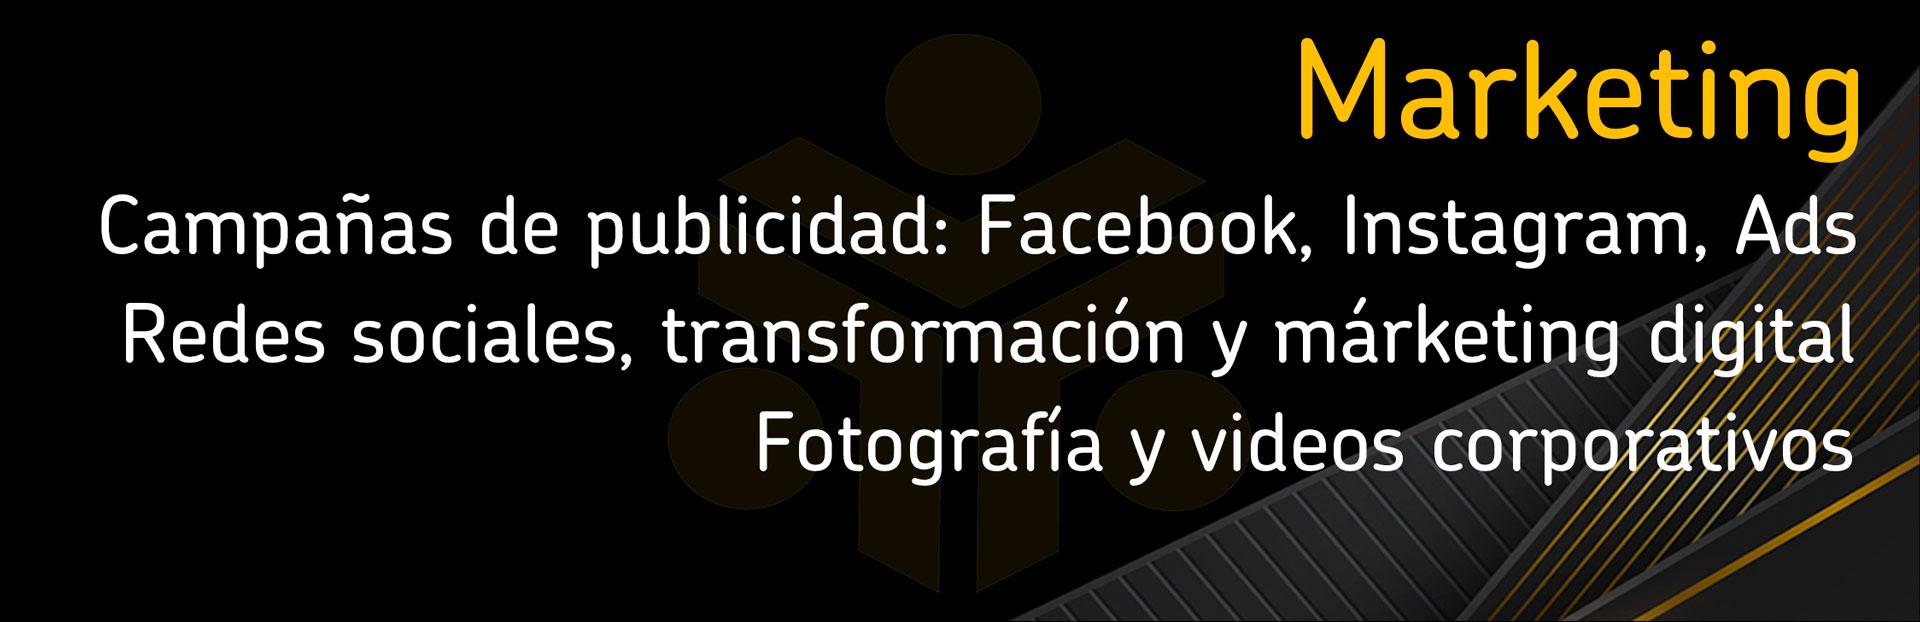 6_marketing.jpg